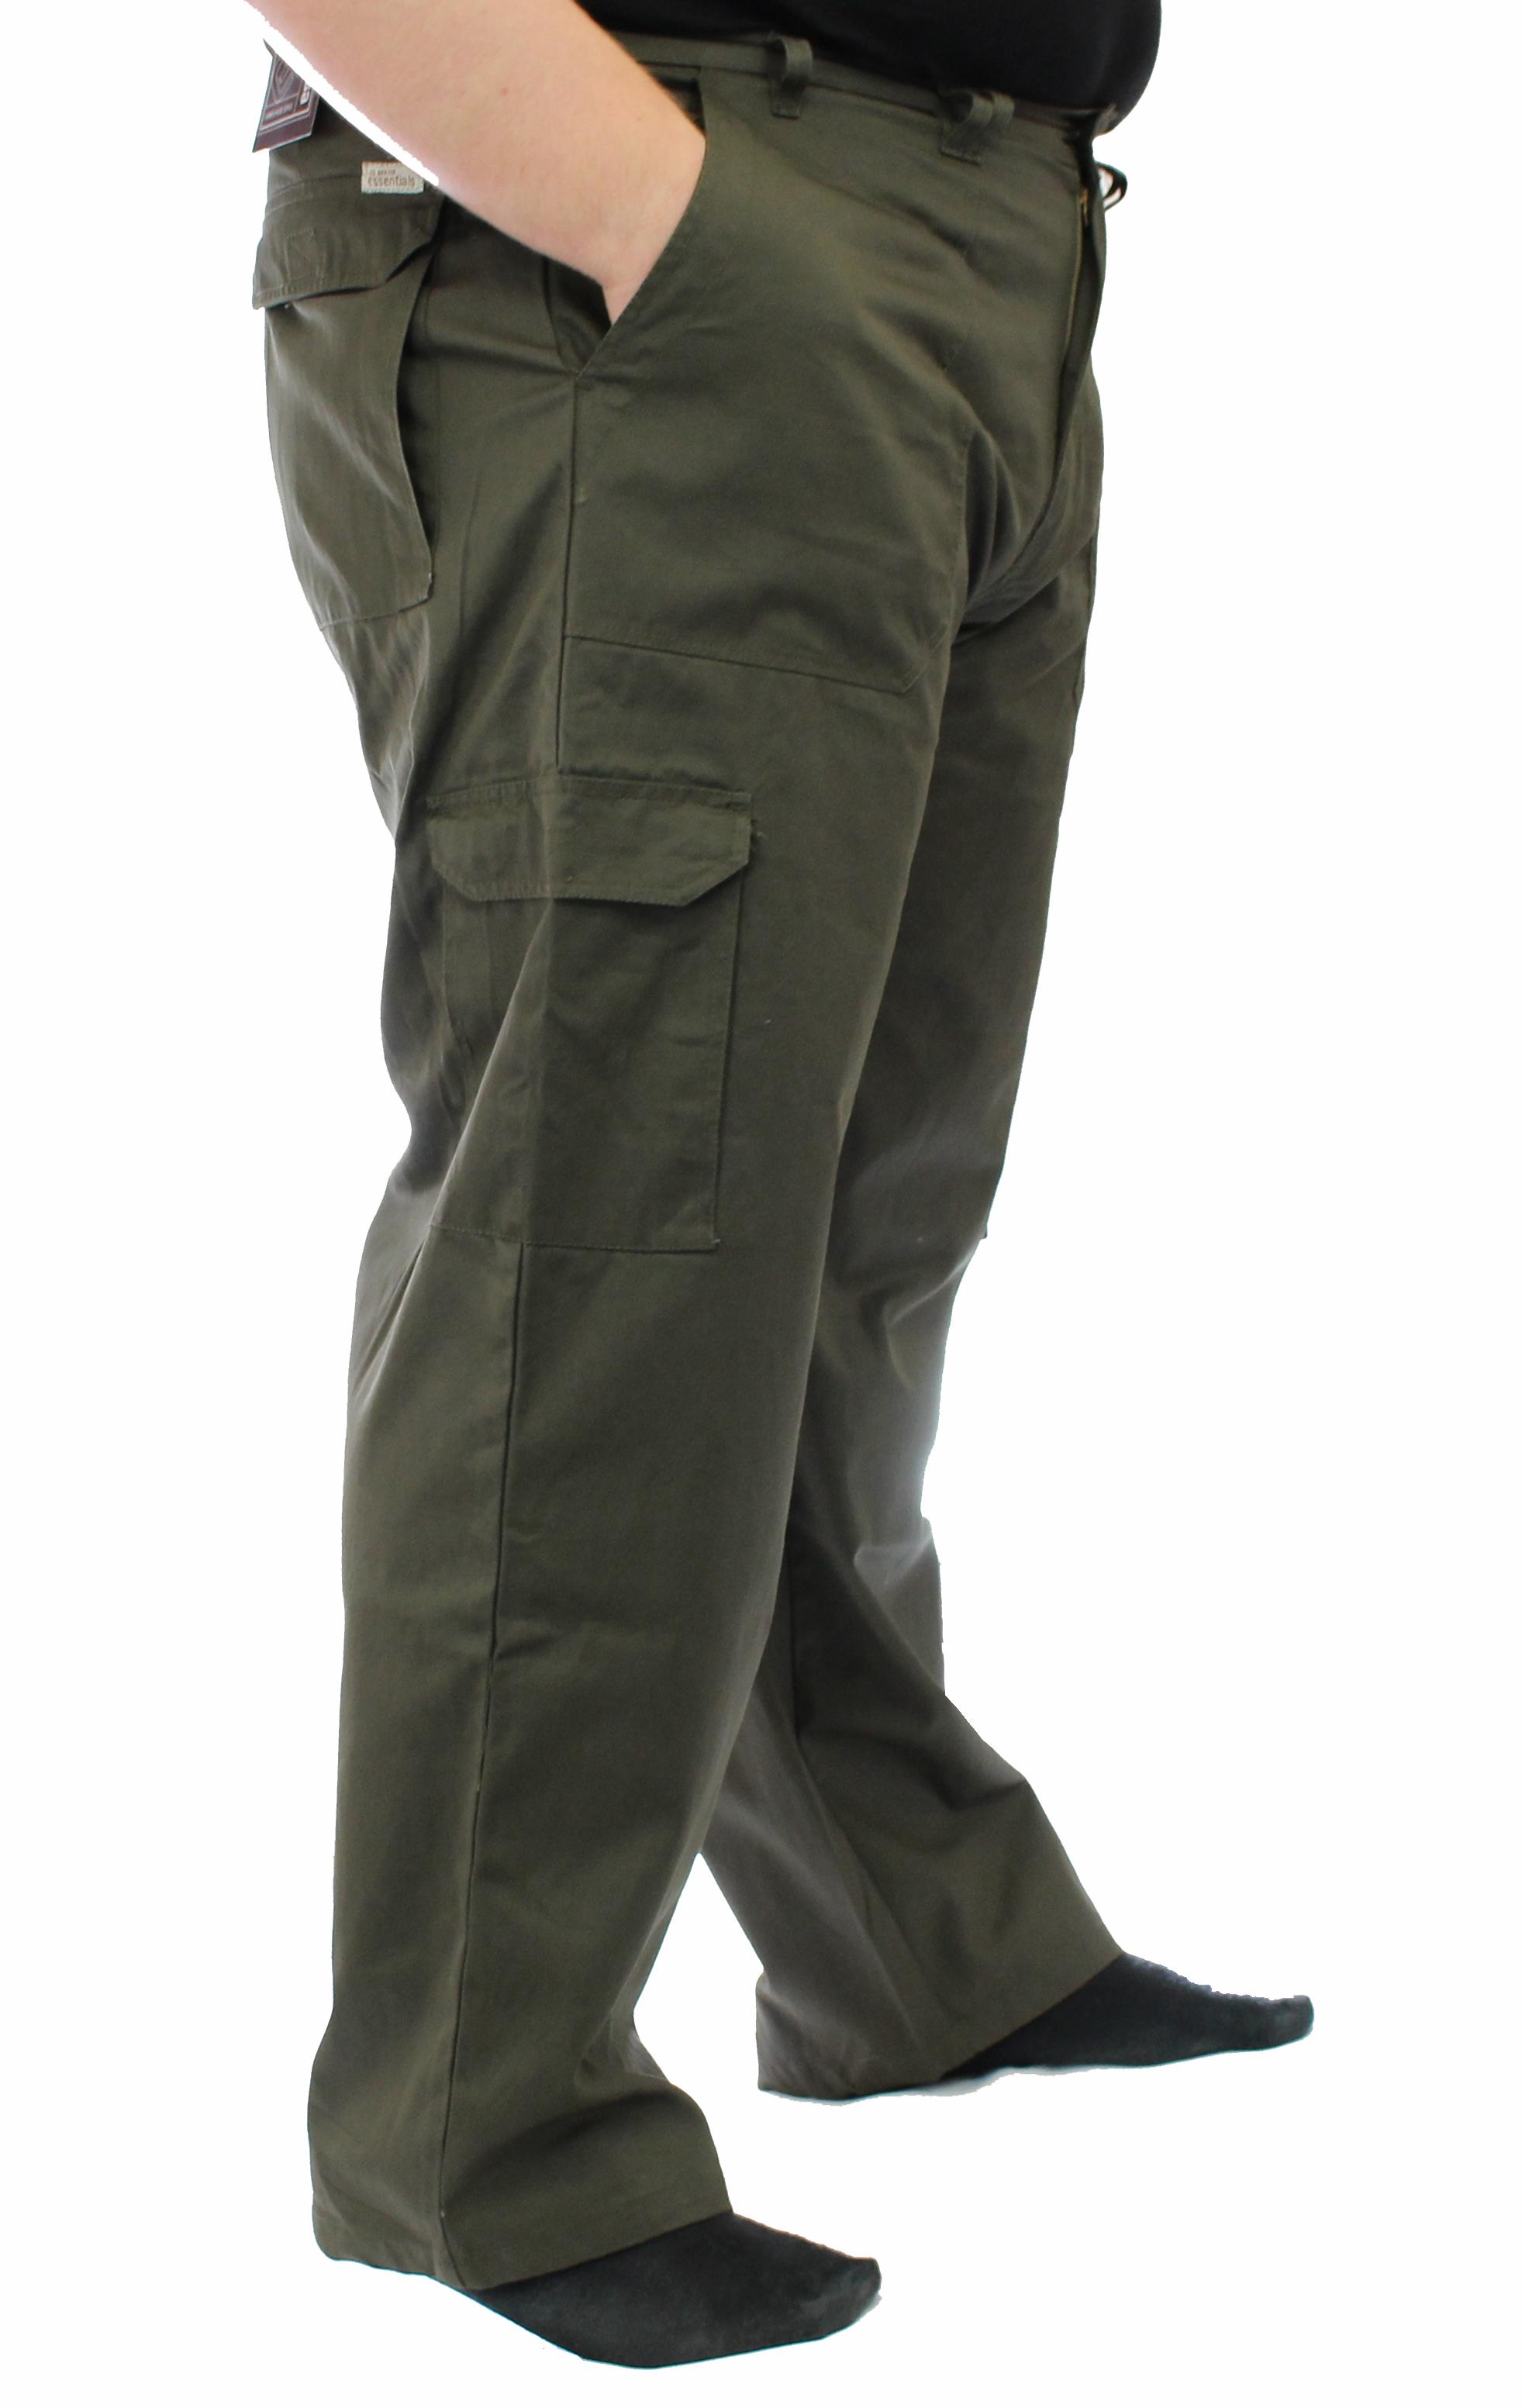 "Ed Baxter Victory - Heavy Duty Cargo Combat Trousers - Khaki - 56"" Waist, 32"" Leg"